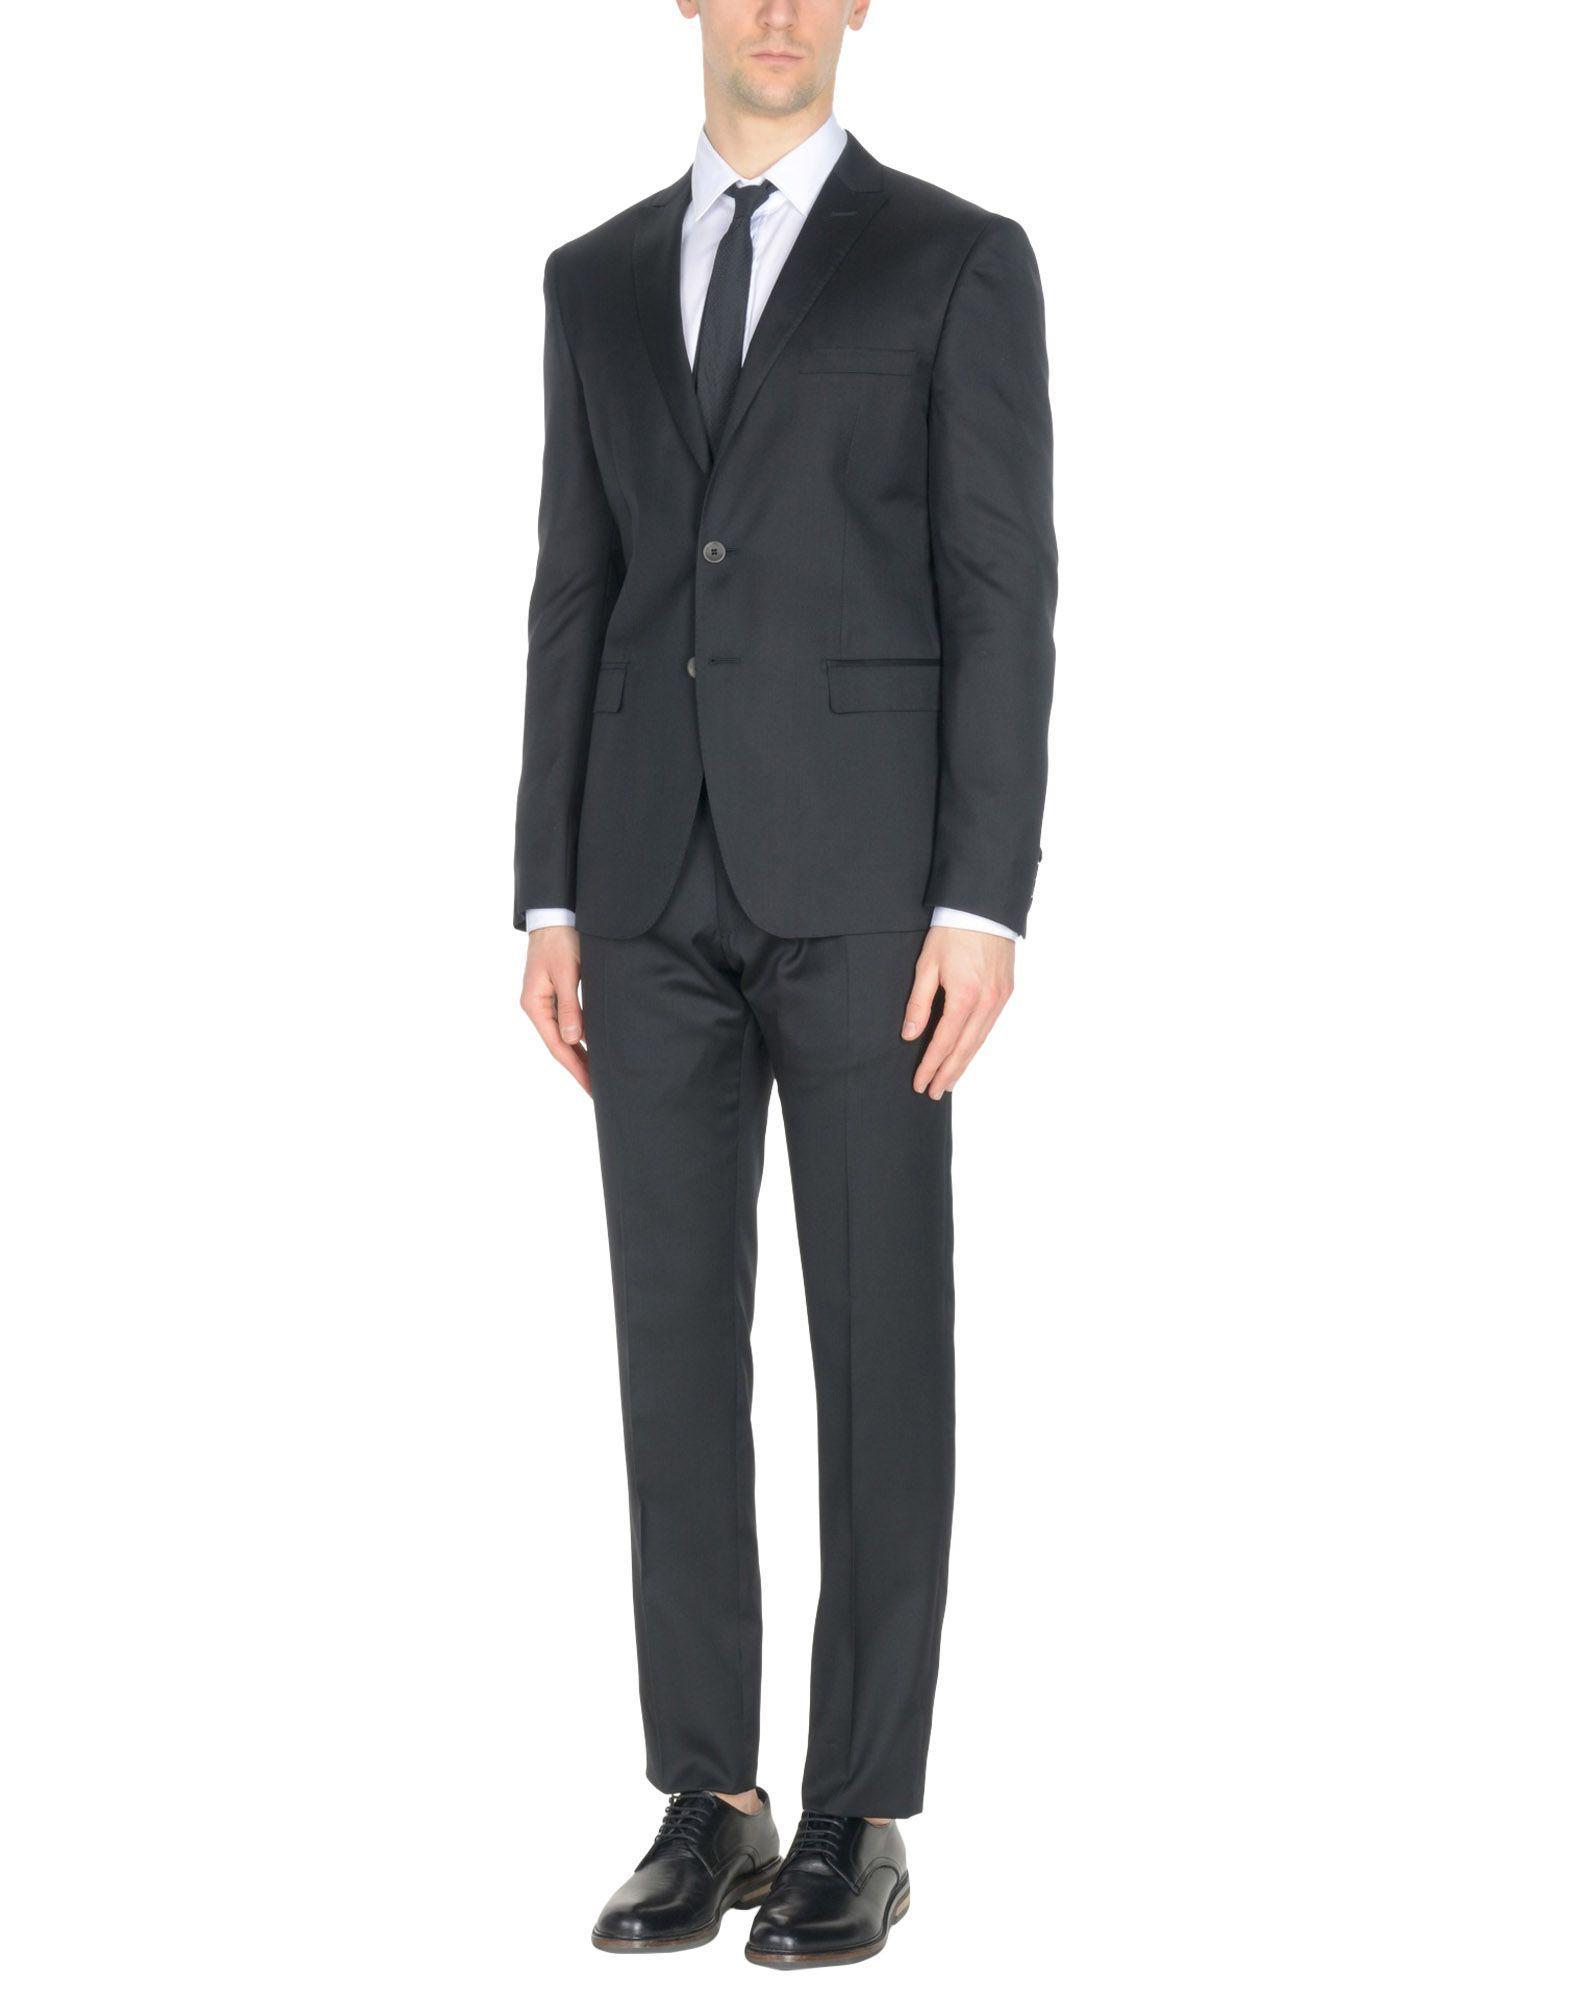 Tonello Suits In Black